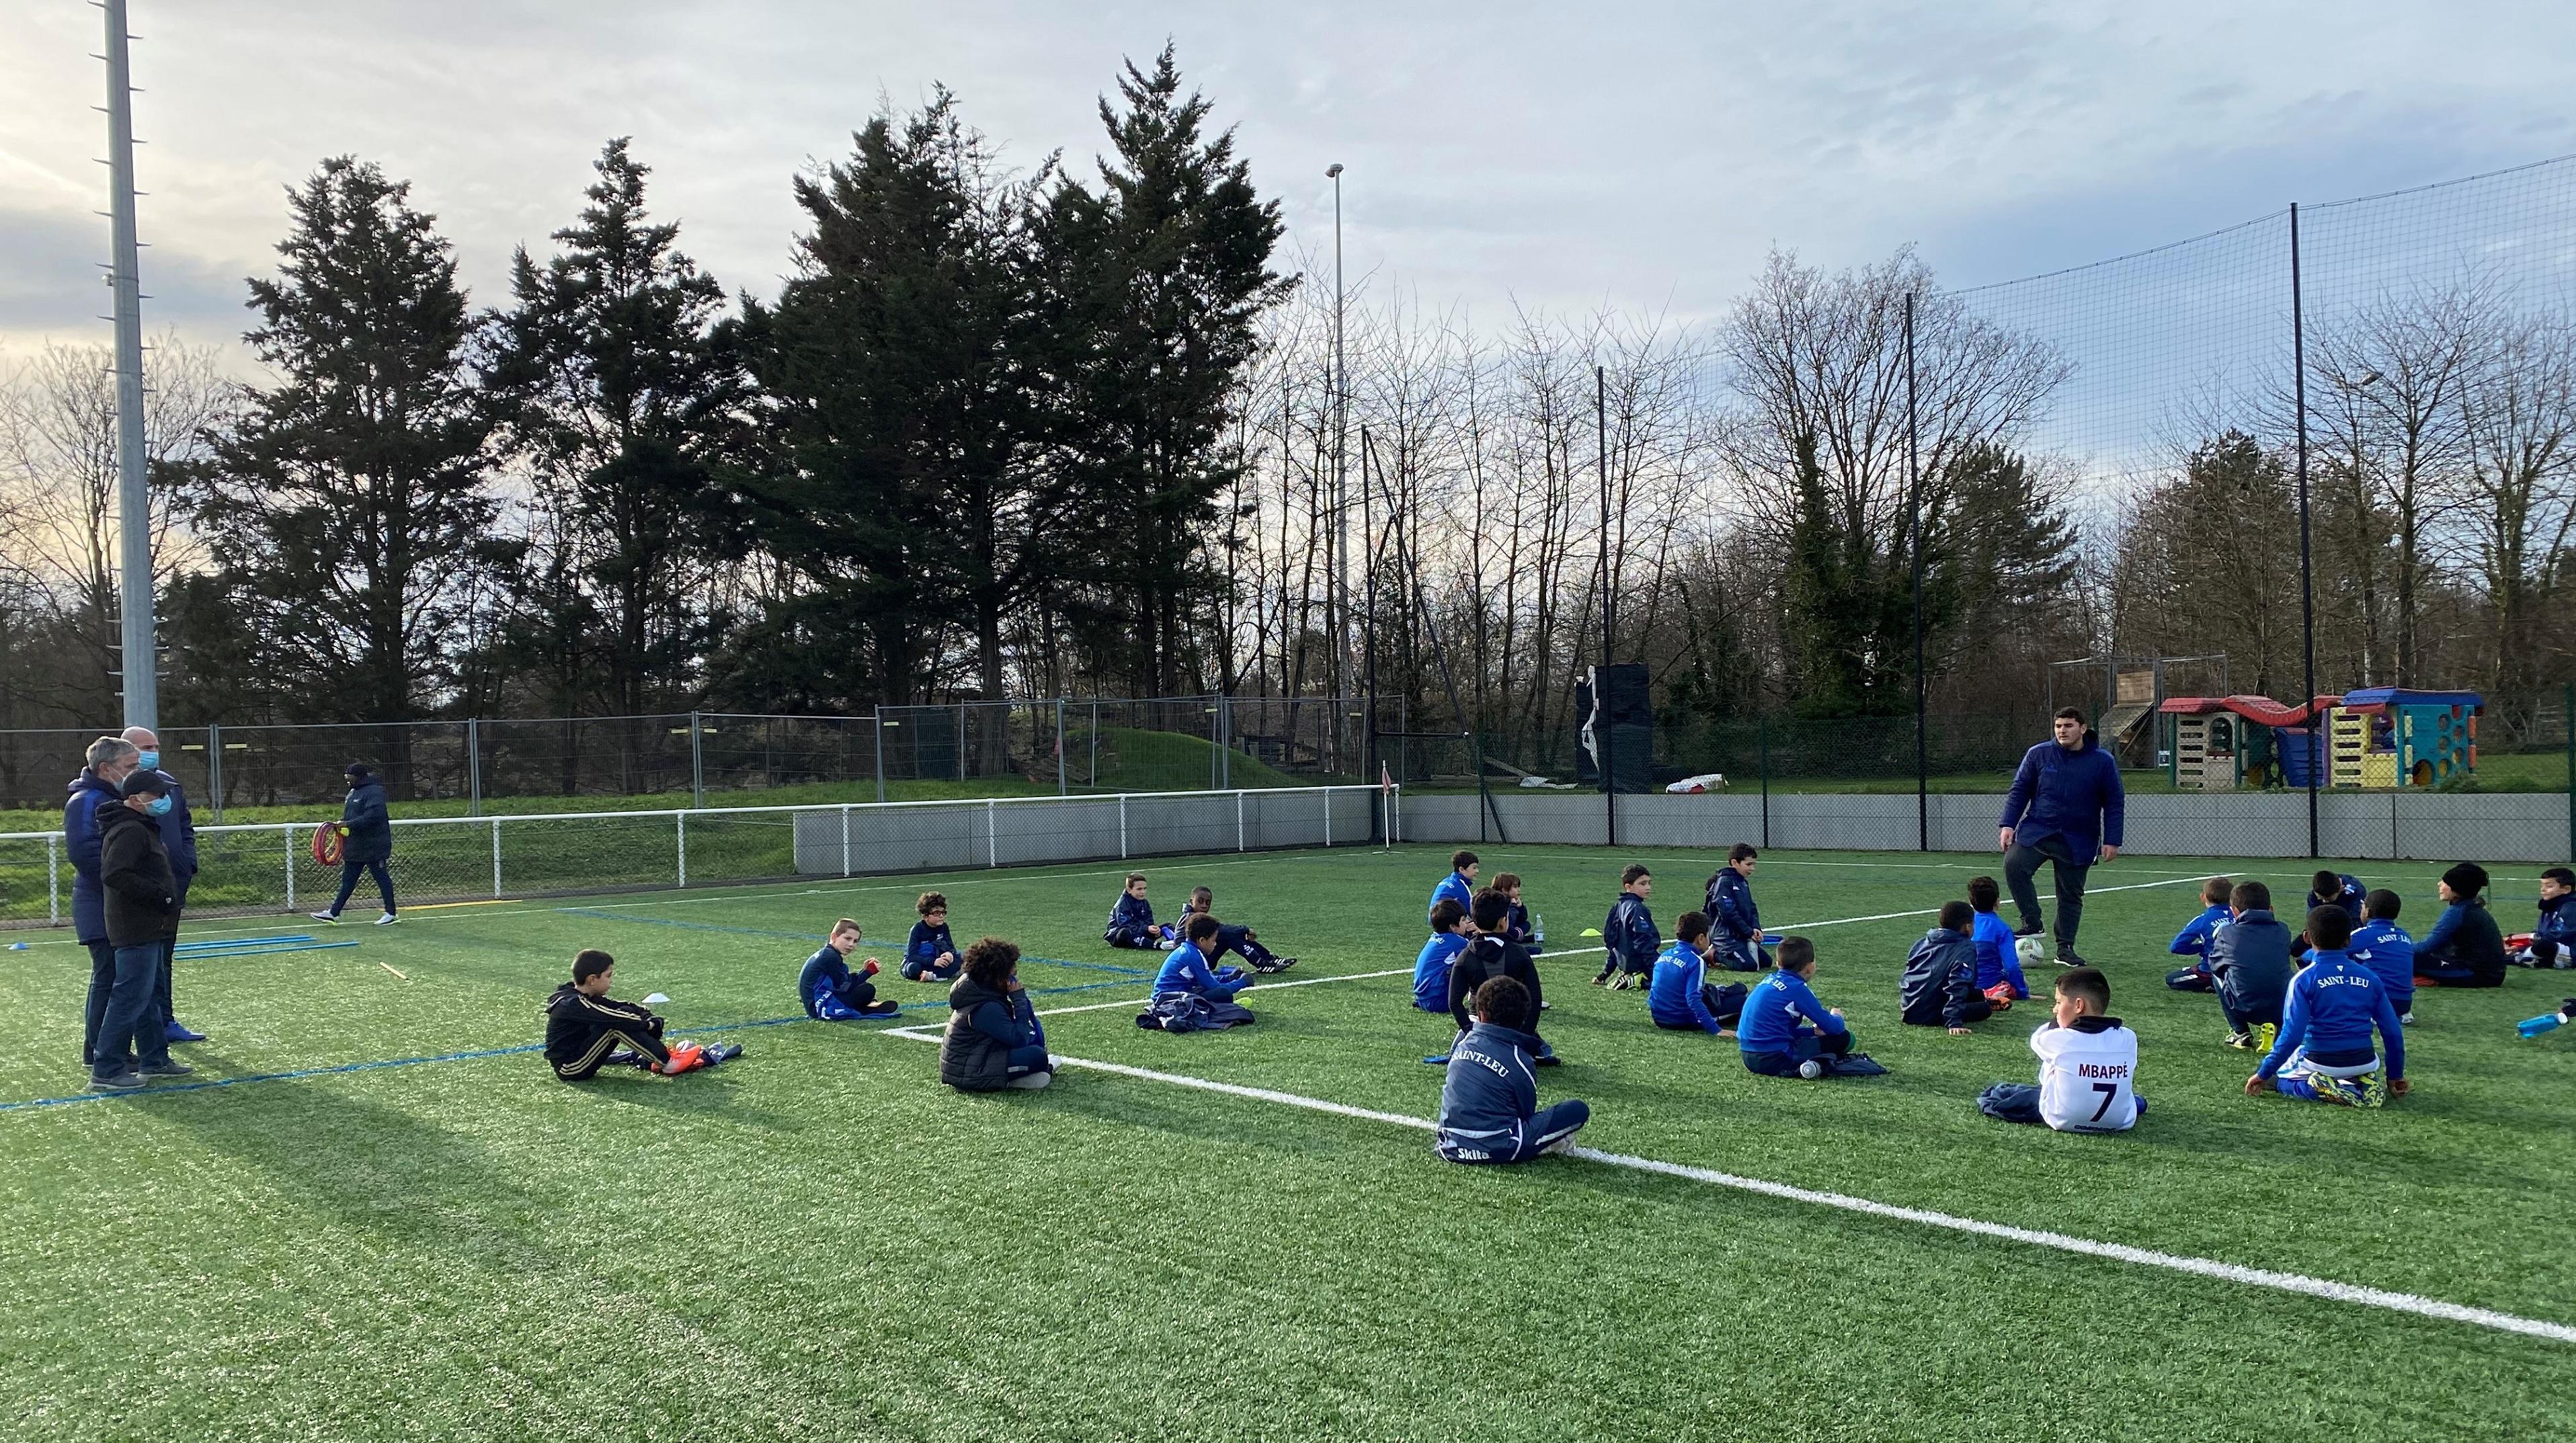 FC Saint-Leu 95 enfants football amateur COVID